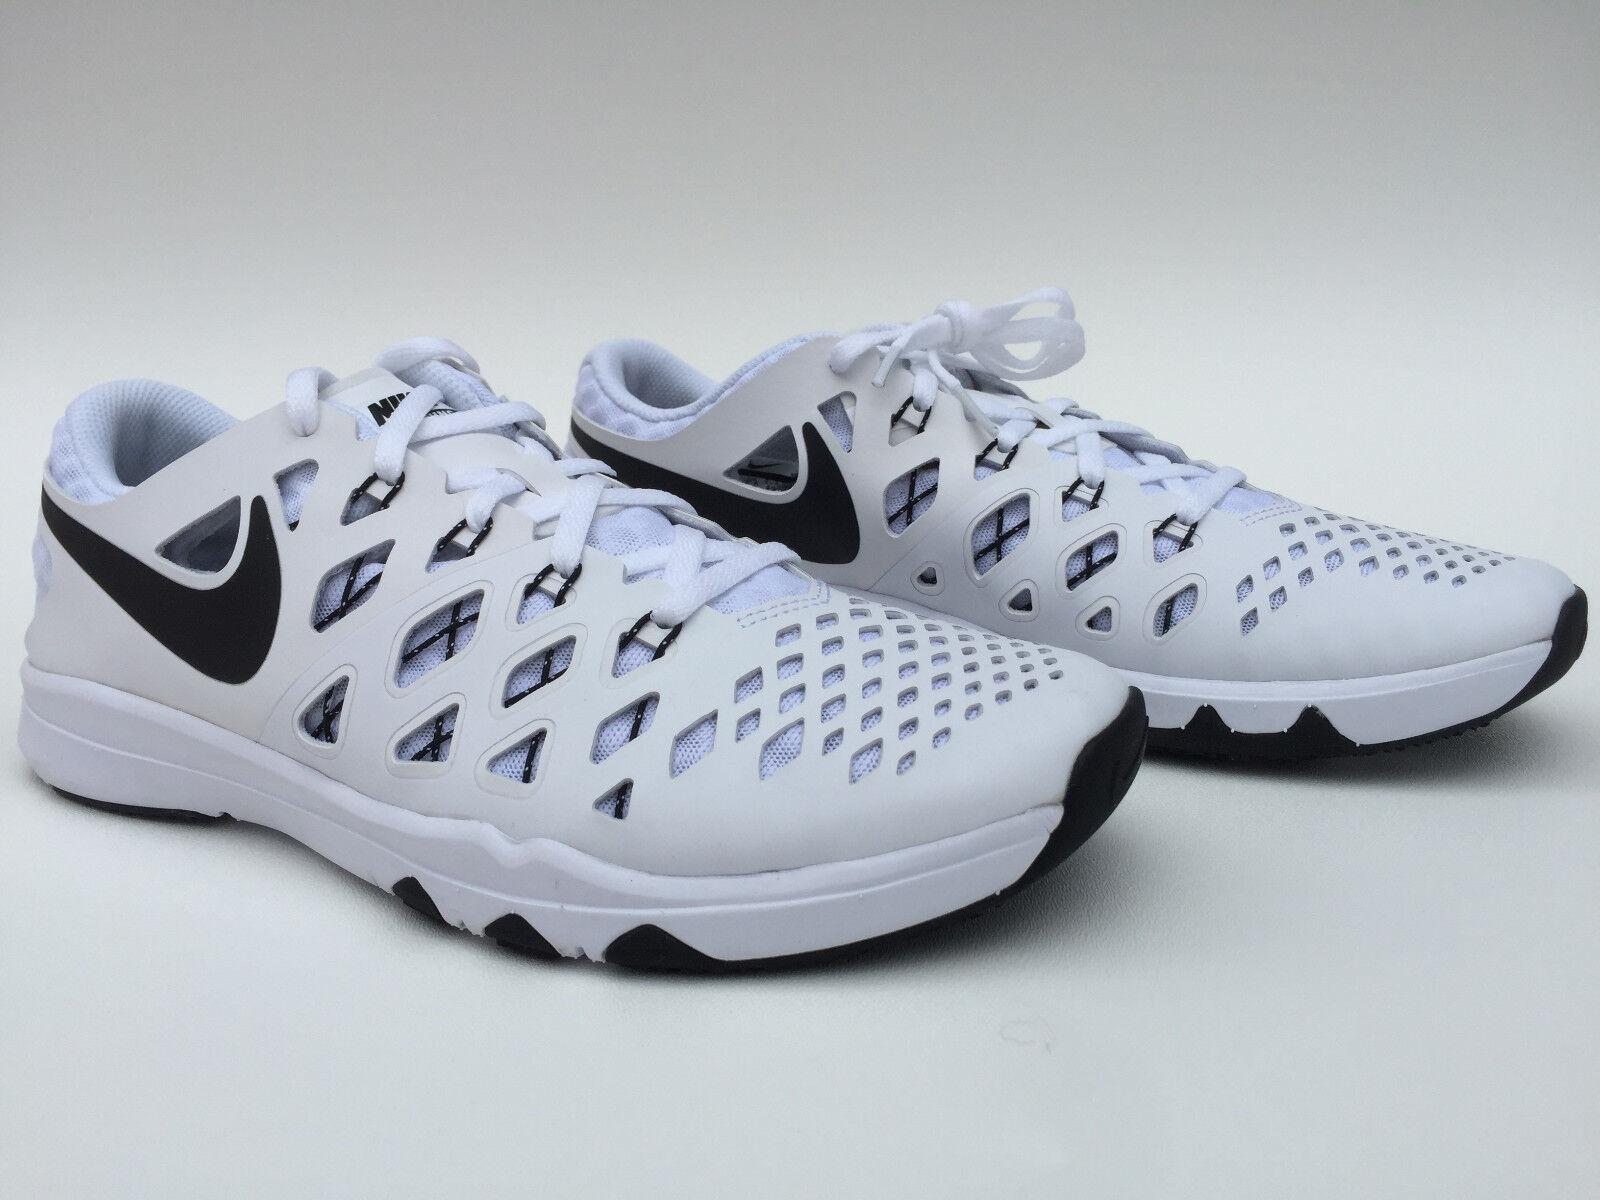 Hombre NIKE  Train Speed 4 Correr/Entrenamiento Zapatos  NIKE Blanco 843937 103 101d95